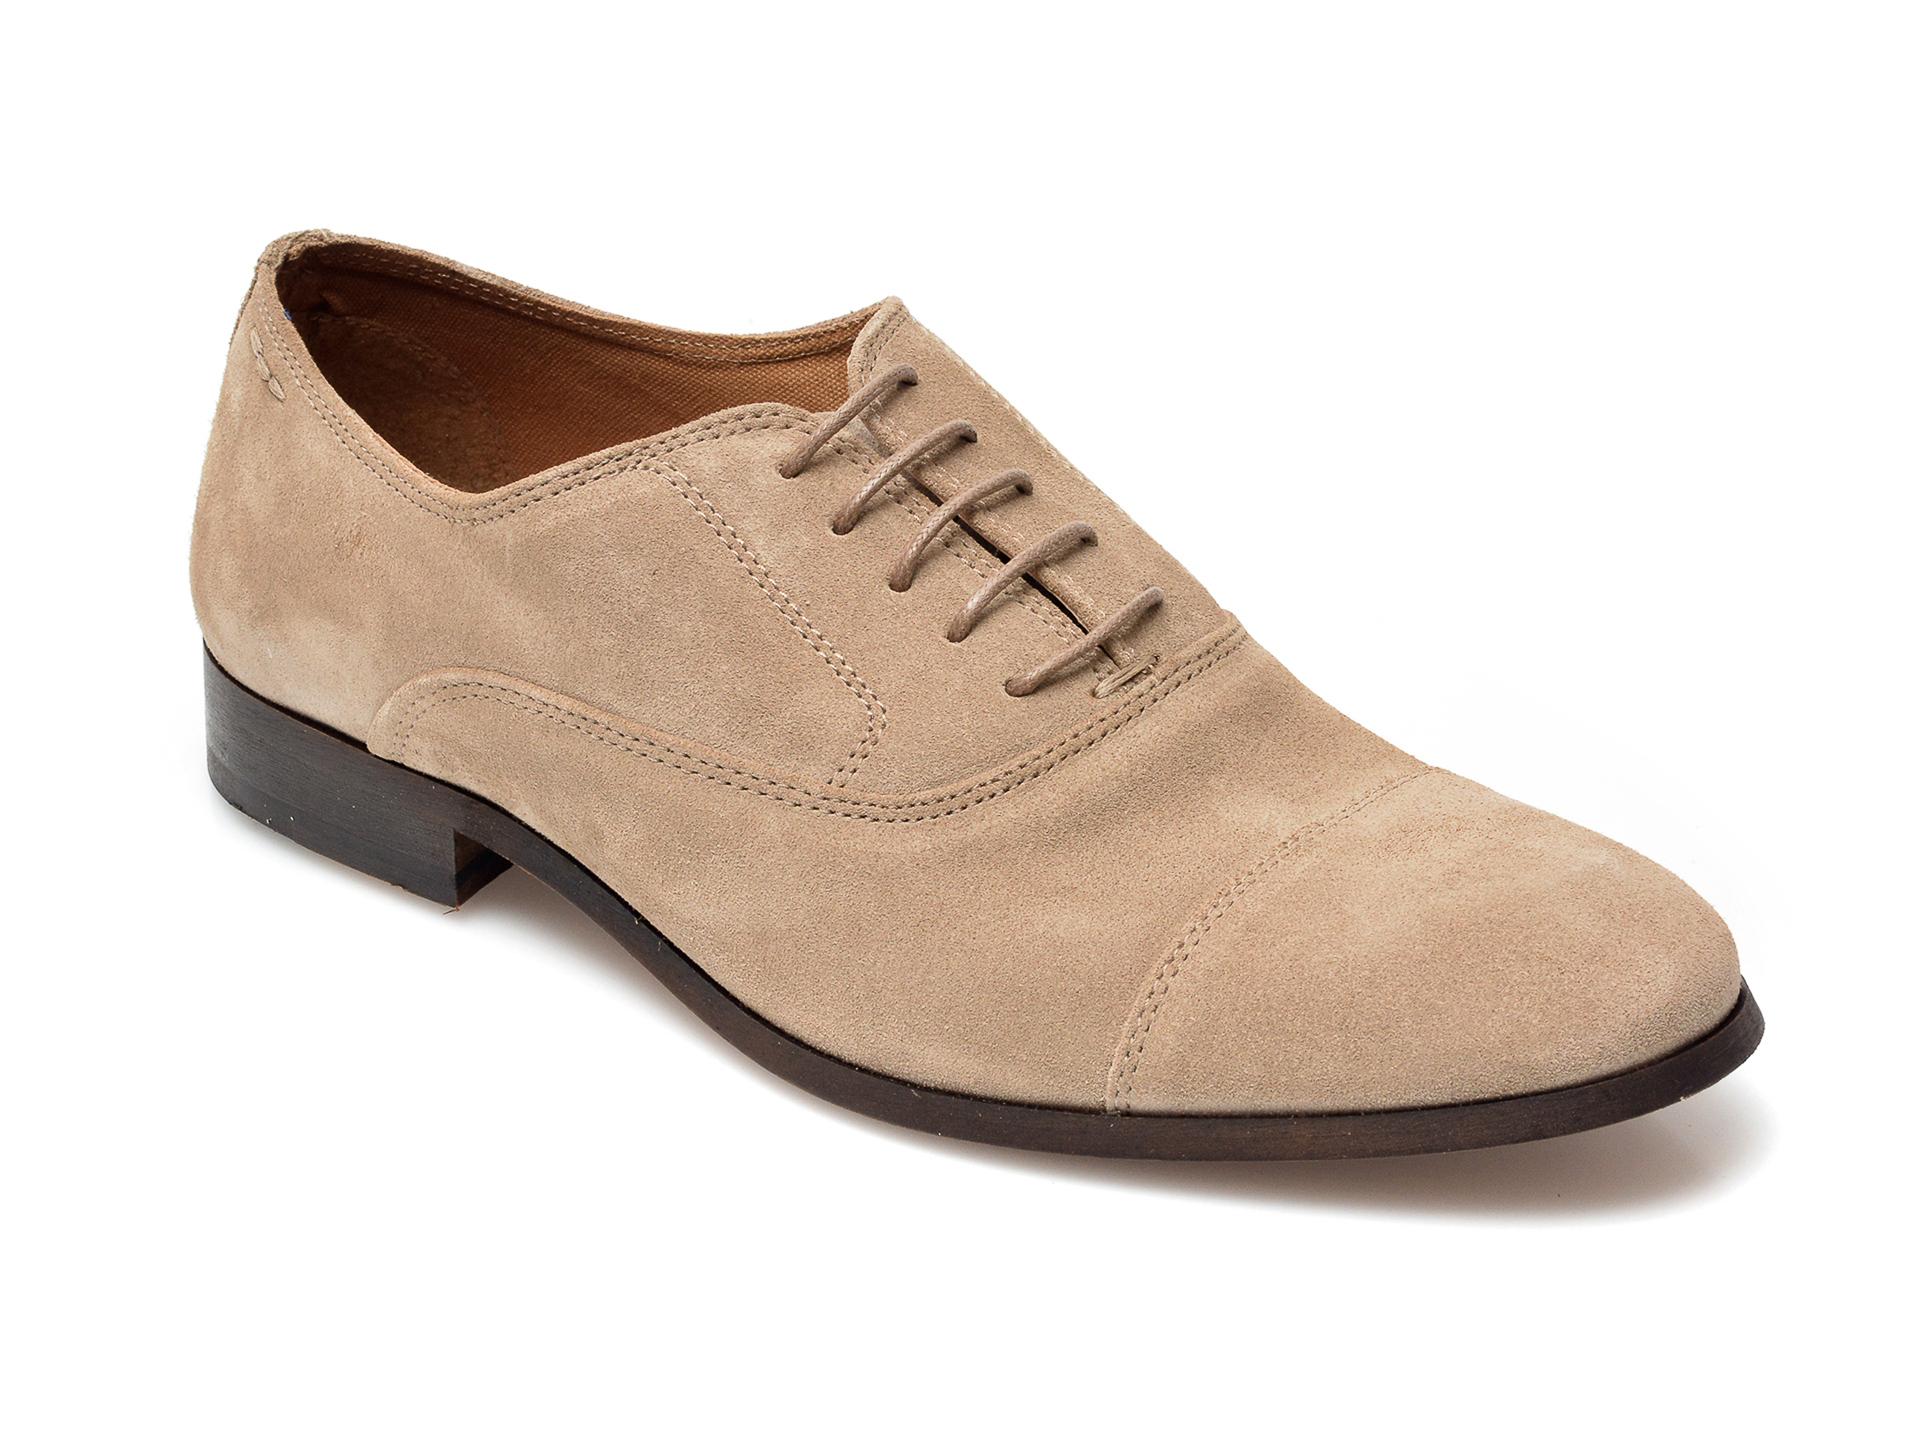 Pantofi ALDO gri, Kirzinger020, din piele intoarsa imagine otter.ro 2021